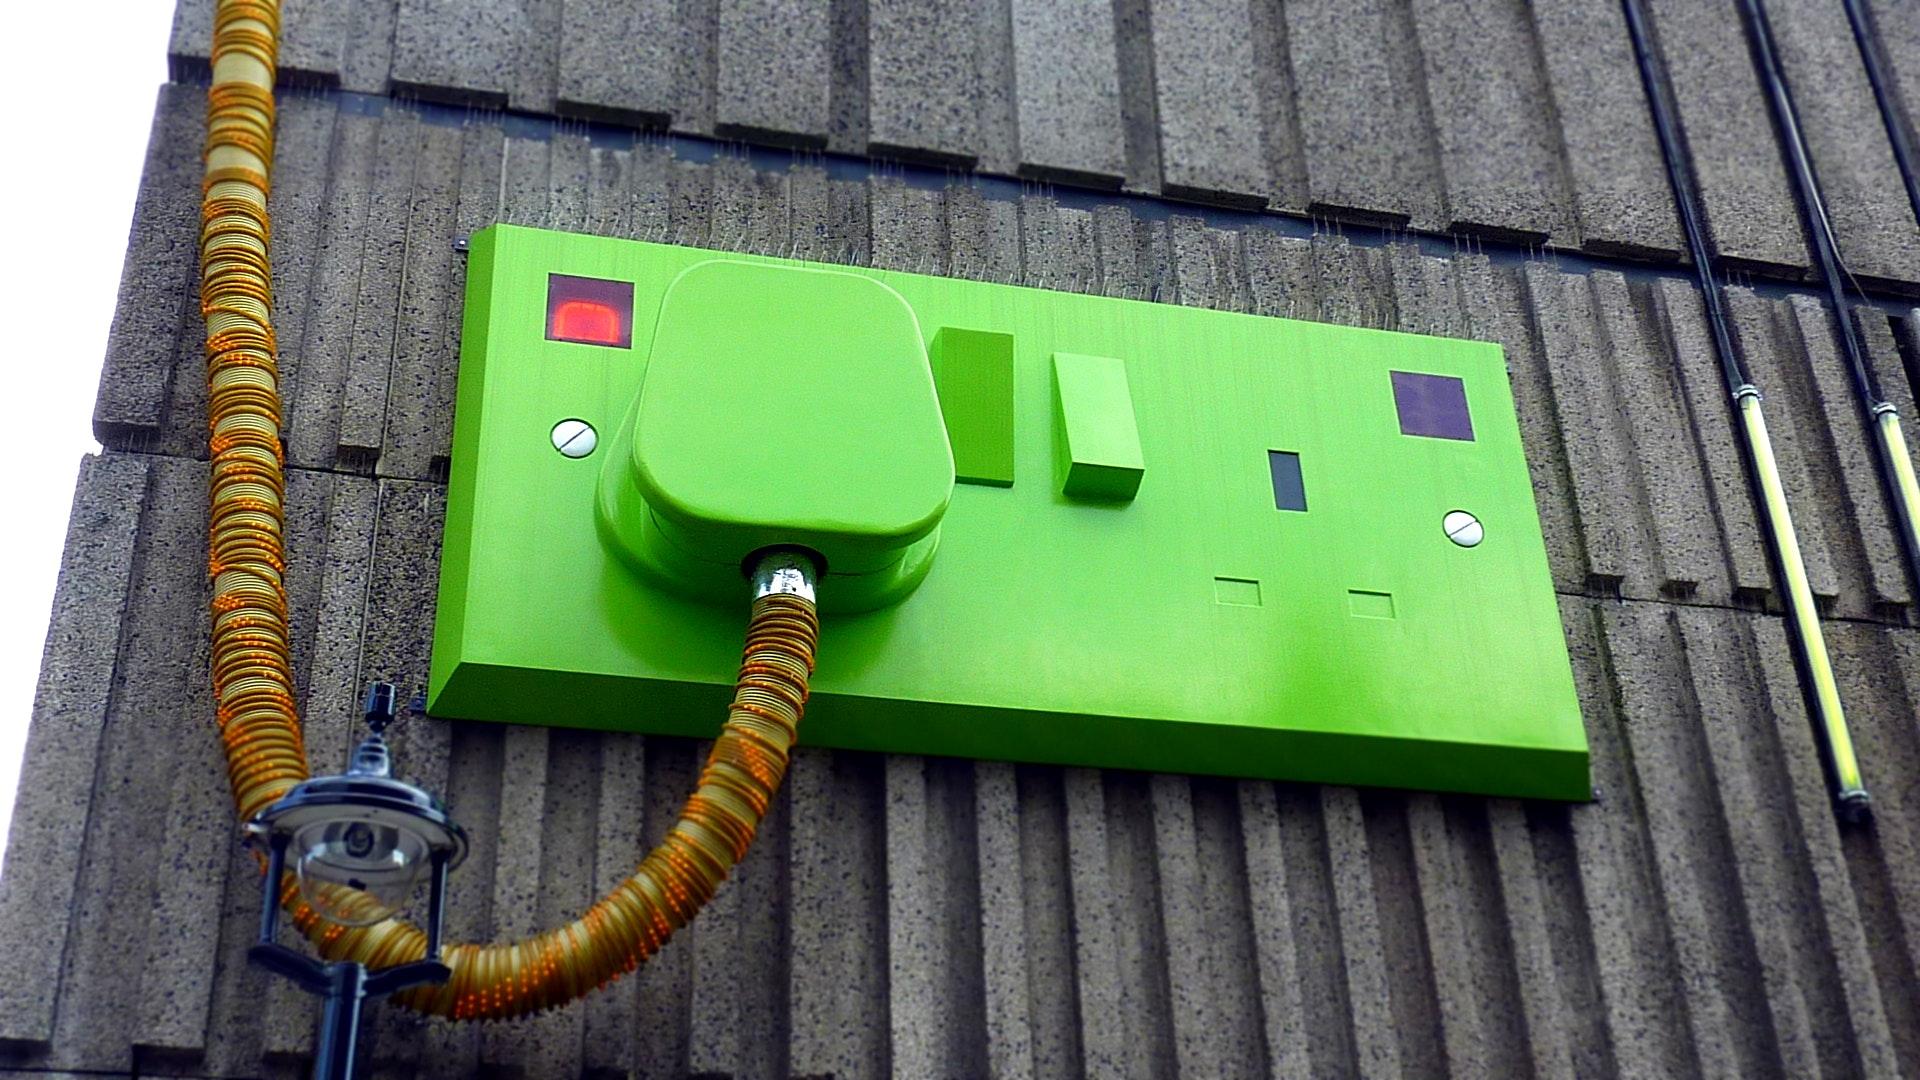 unplug appliances Tucson